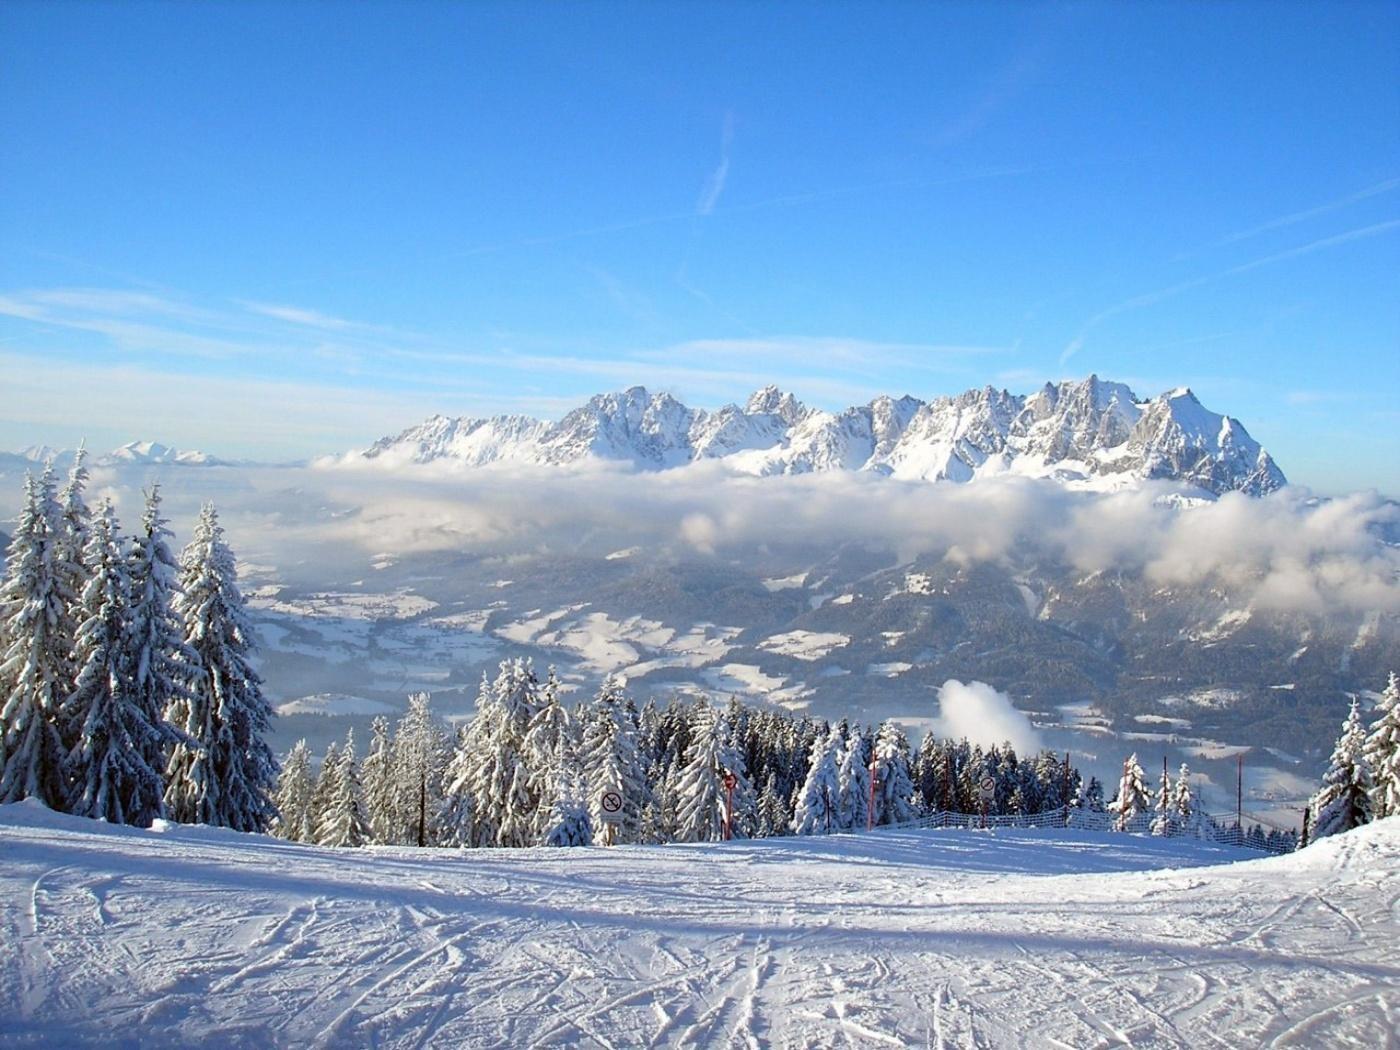 Зимние пейзажи обои (картинки, фото), рамантическое место для ...